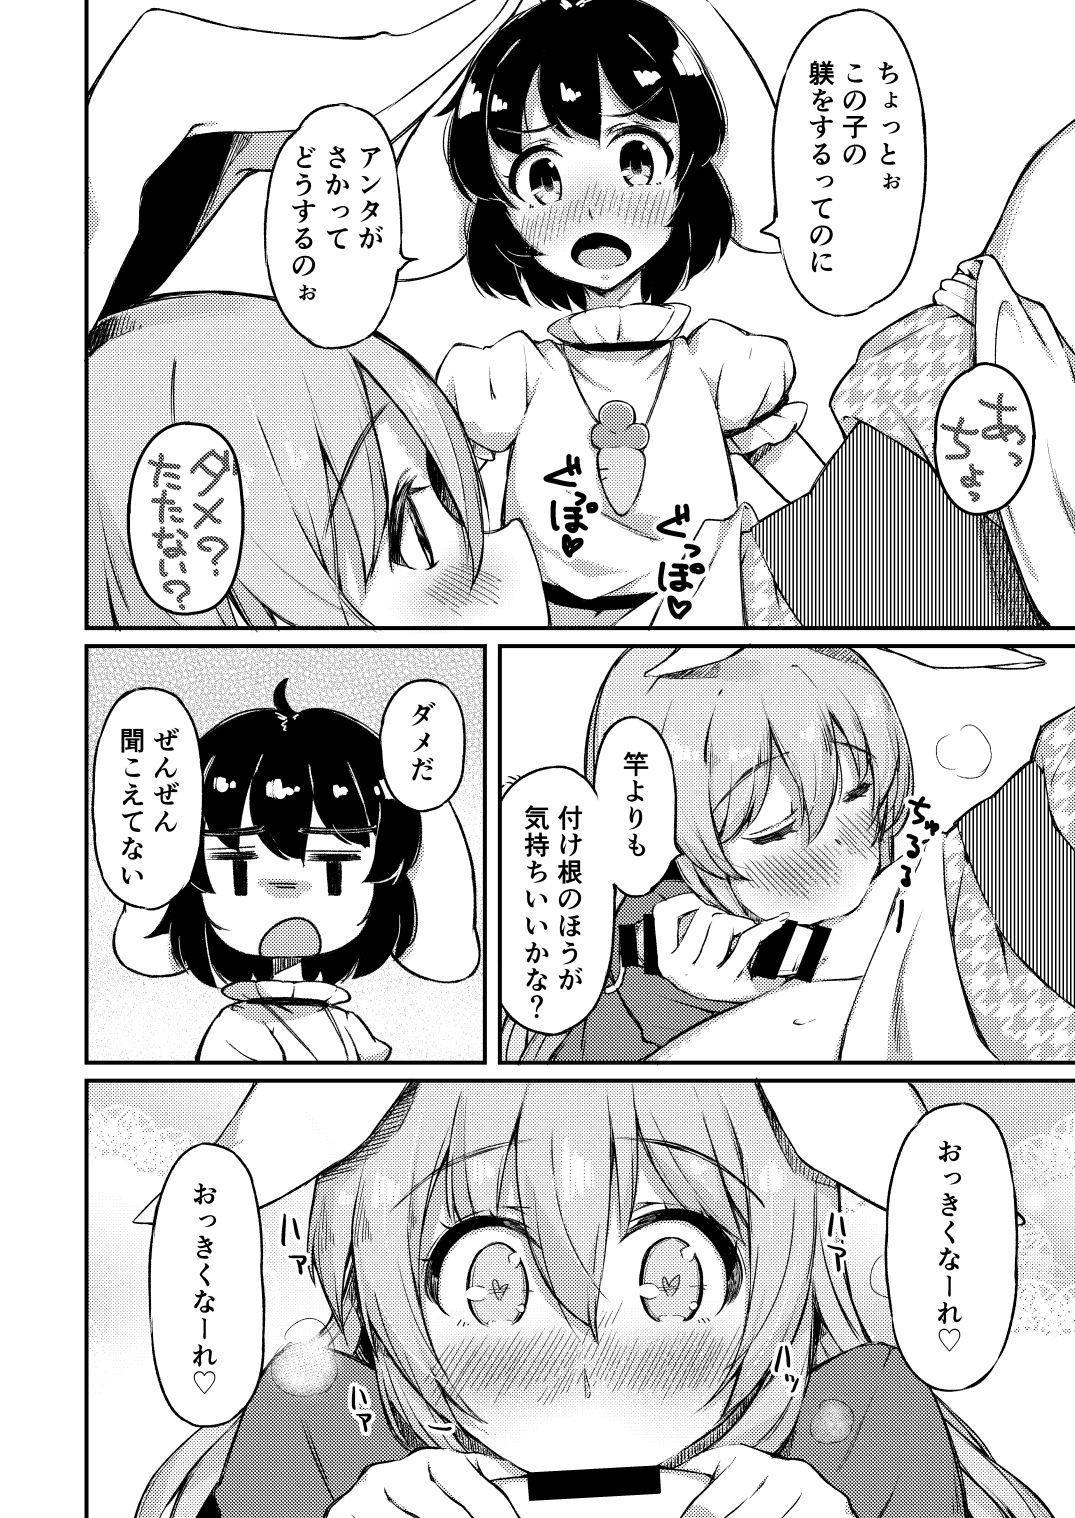 UdoTewi no, Gochisousama! 12